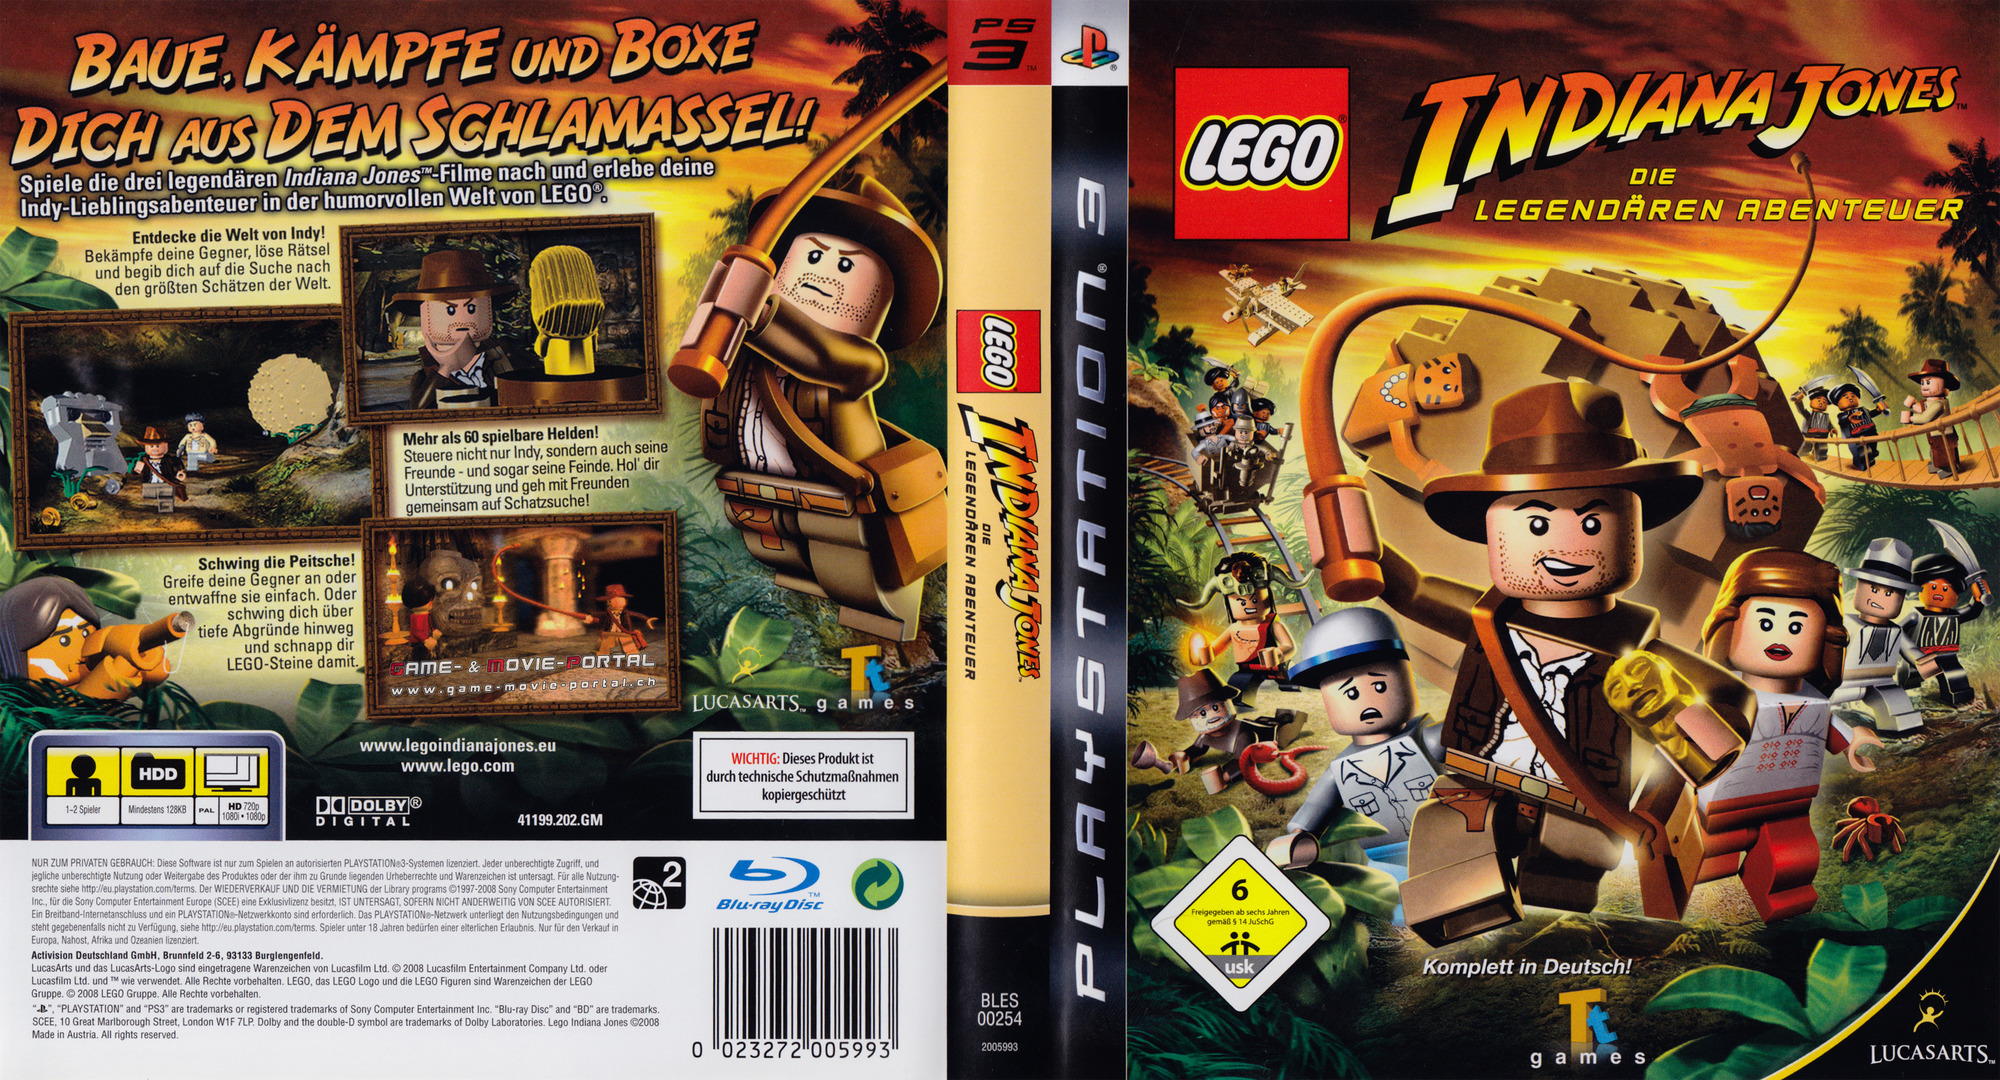 Lego Indiana Jones: Die Legendären Abenteuer PS3 coverfullHQ (BLES00254)